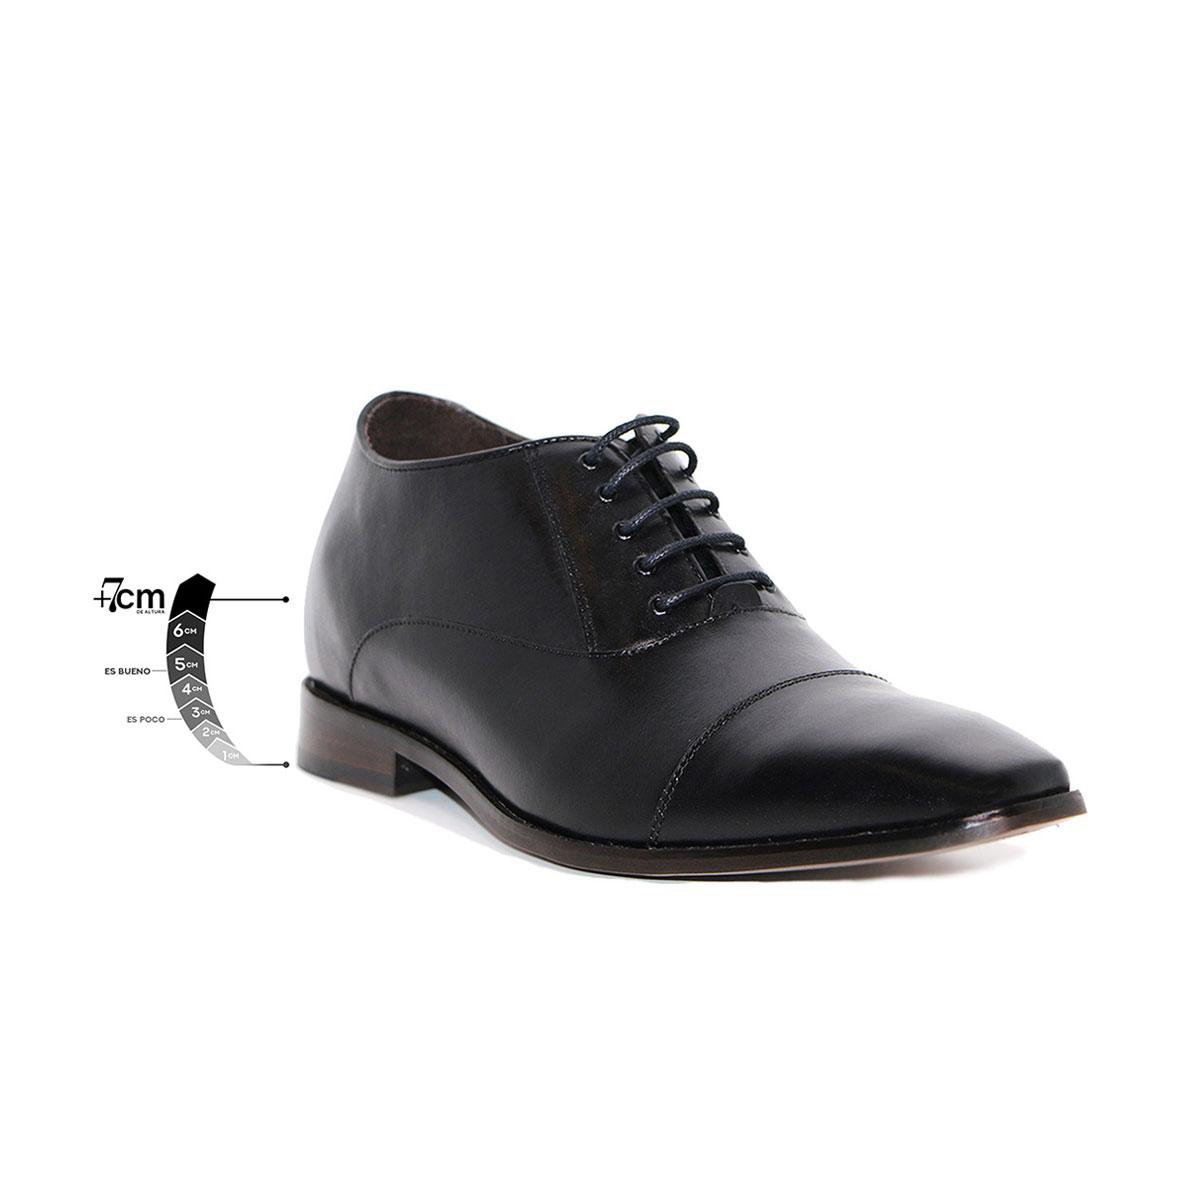 Zapato Formal Director Negro Max Denegri +7cms De Altura_76301